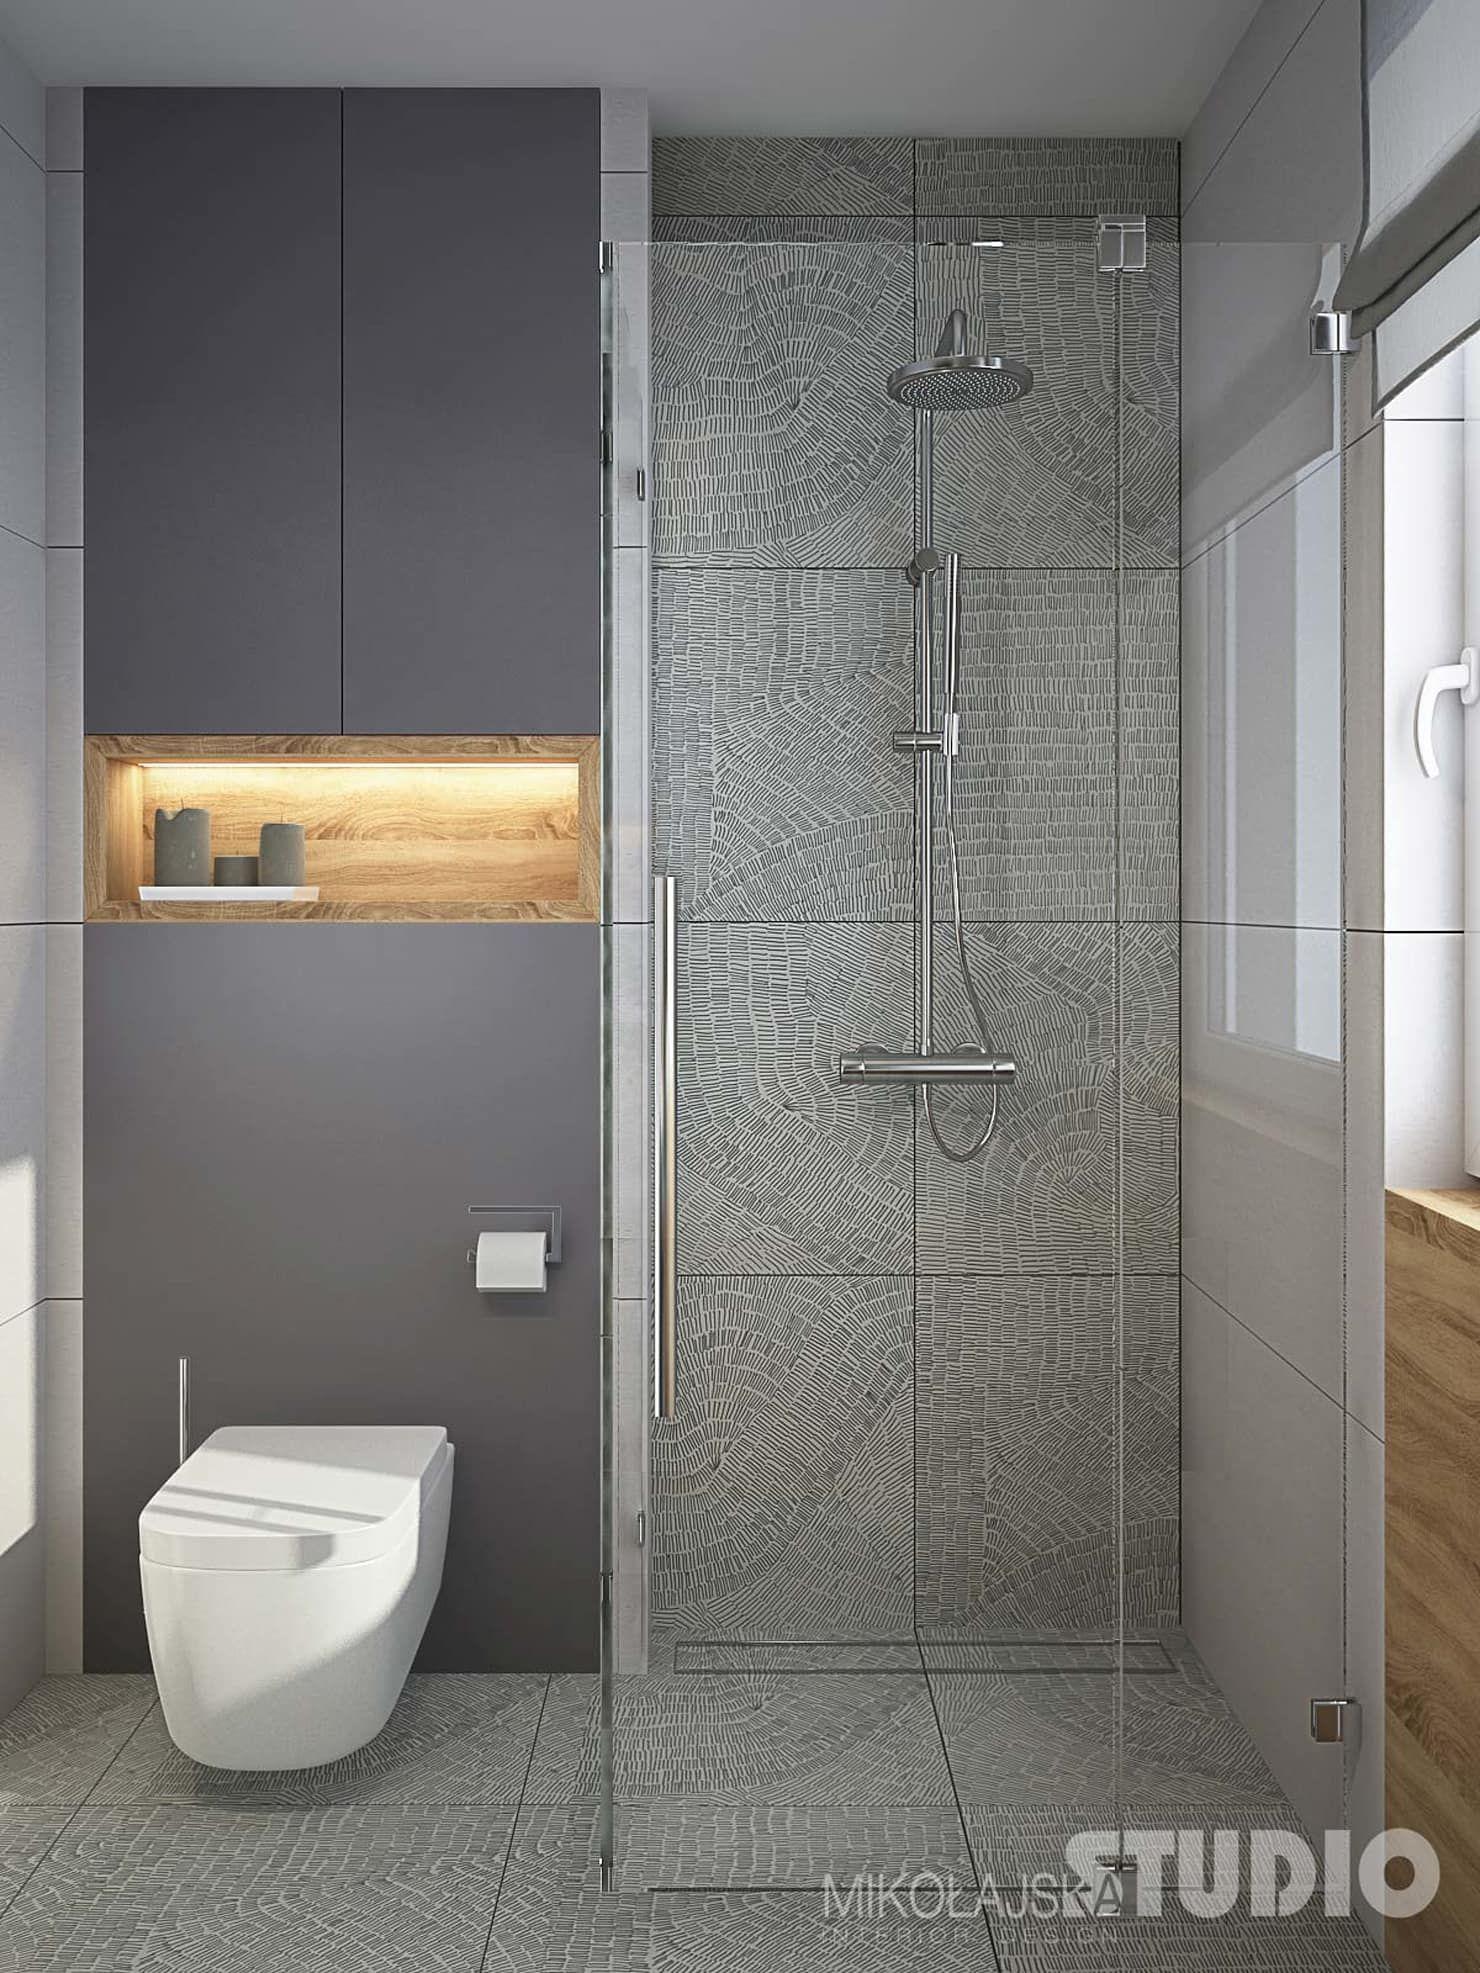 Schone Moderne Badezimmer Industriale Badezimmer Von Mikolajskastudio Industrial Idee Salle De Bain Salle De Bain Toilettes